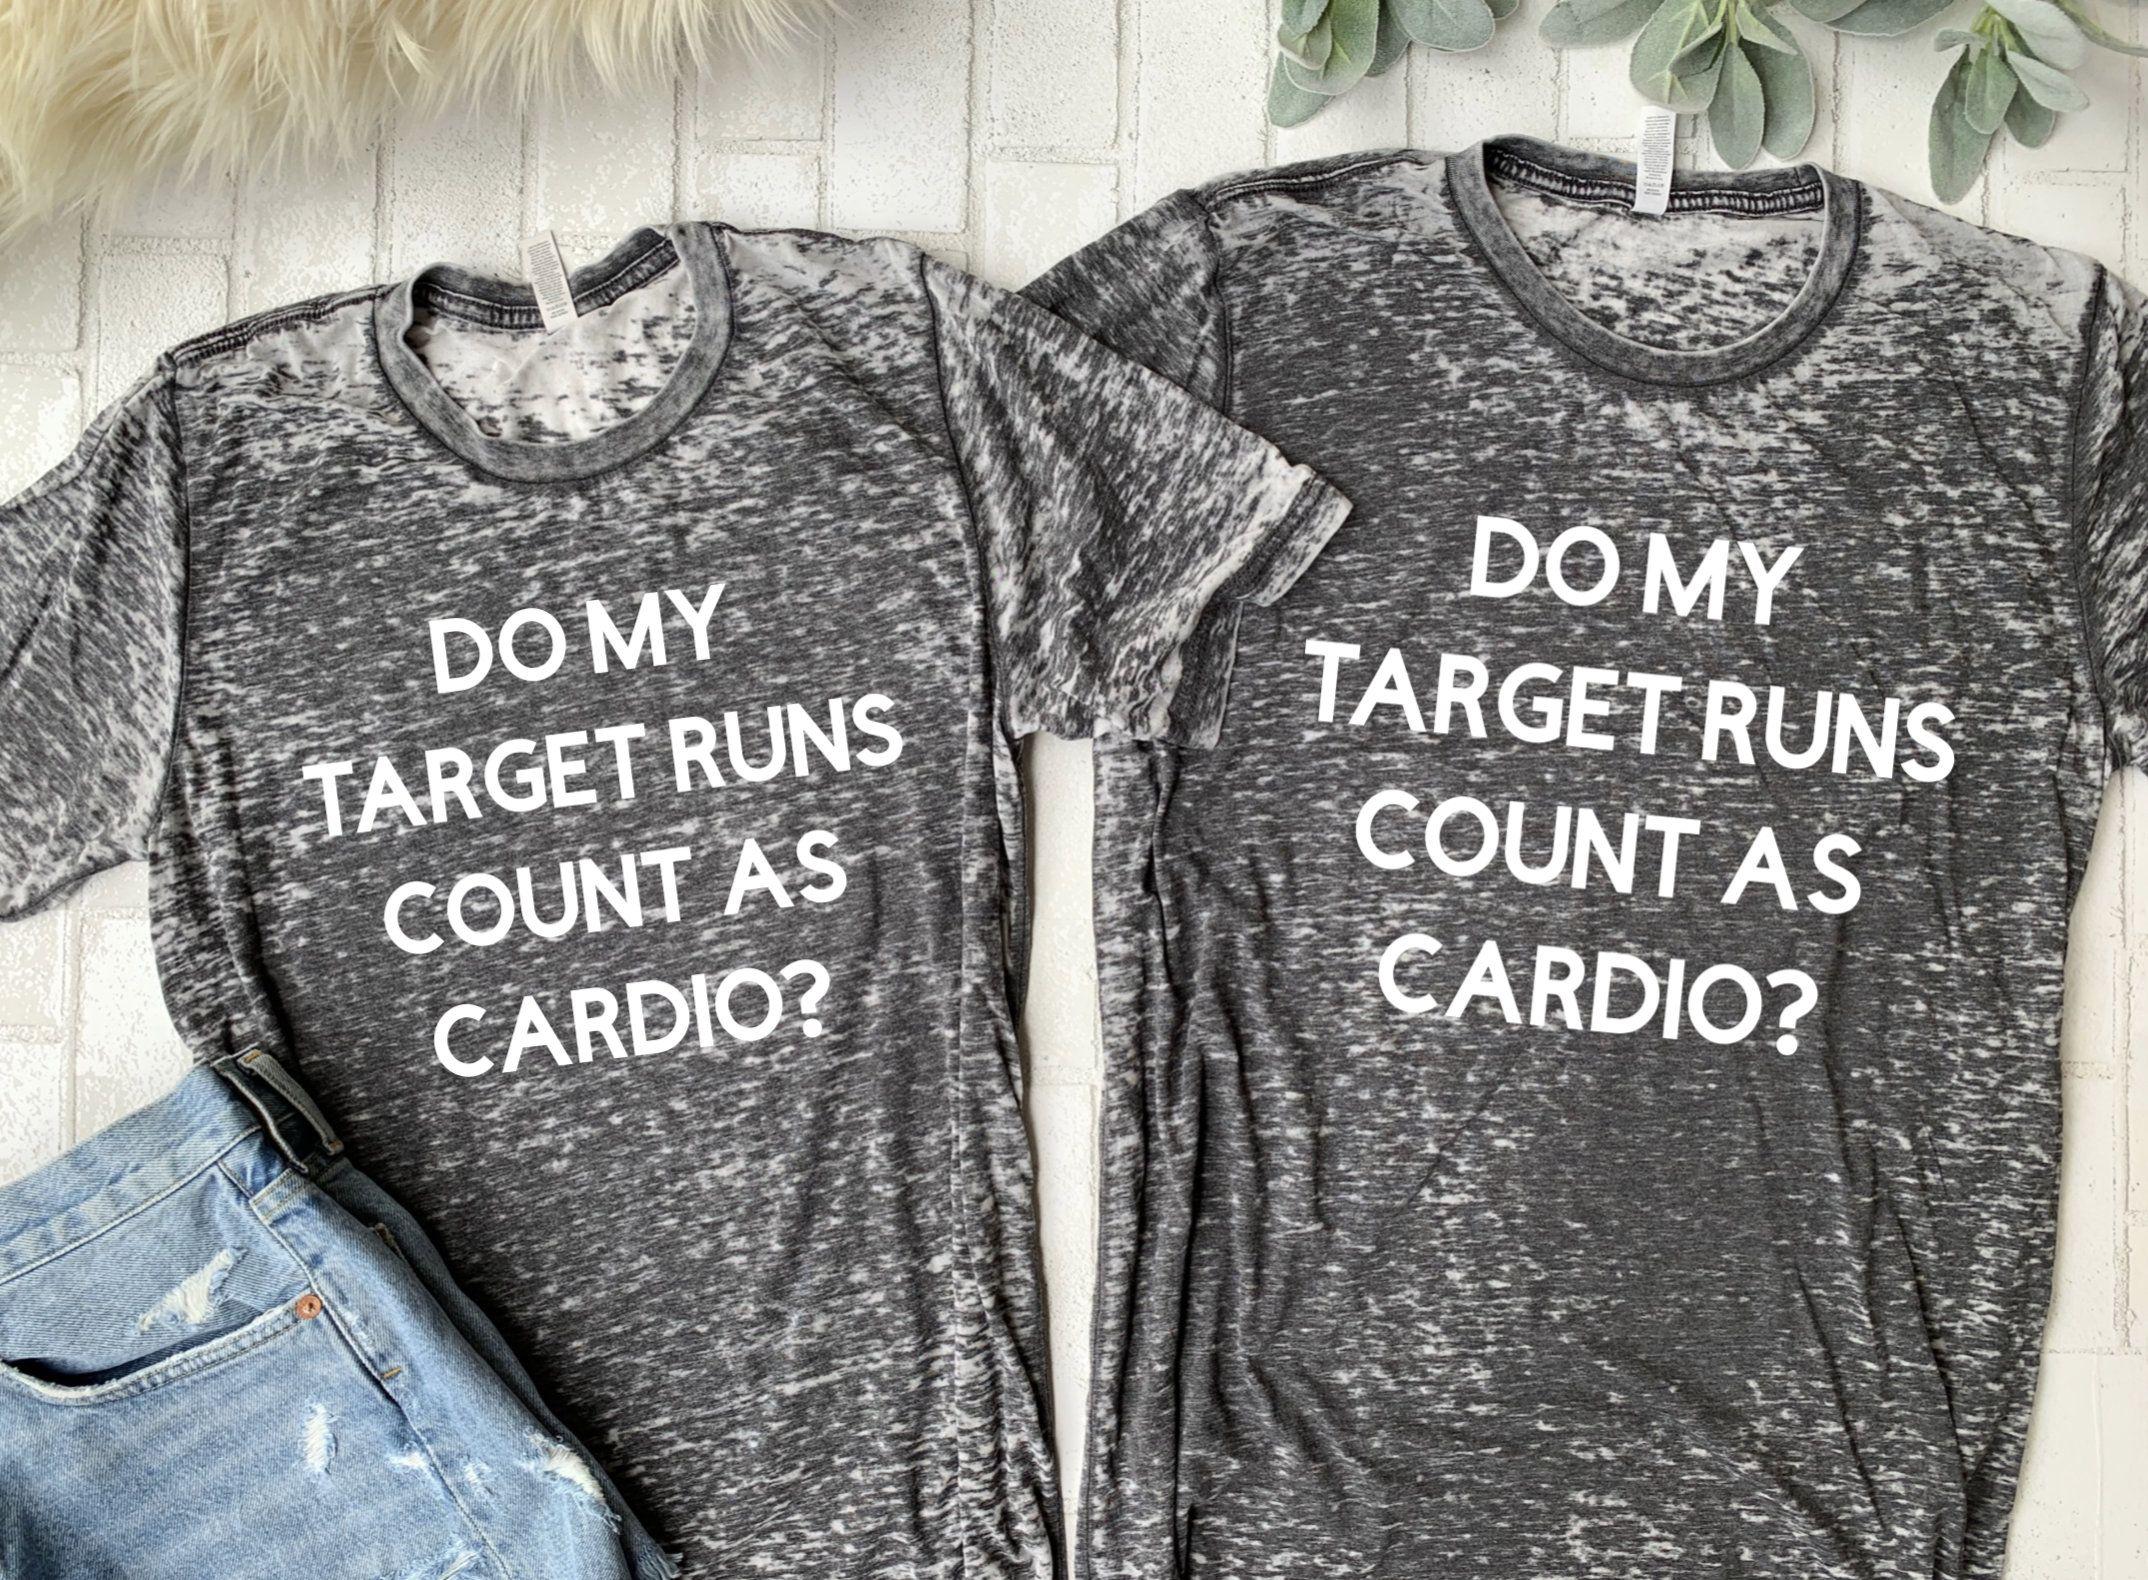 Target Cardio Sweatshirt Target Sweatshirt Target And Starbucks Mom Sweatshirt Mom Gift Target Runs Sister Gift Mom Sweatshirt Casual Shirts Sweatshirts [ 1580 x 2148 Pixel ]